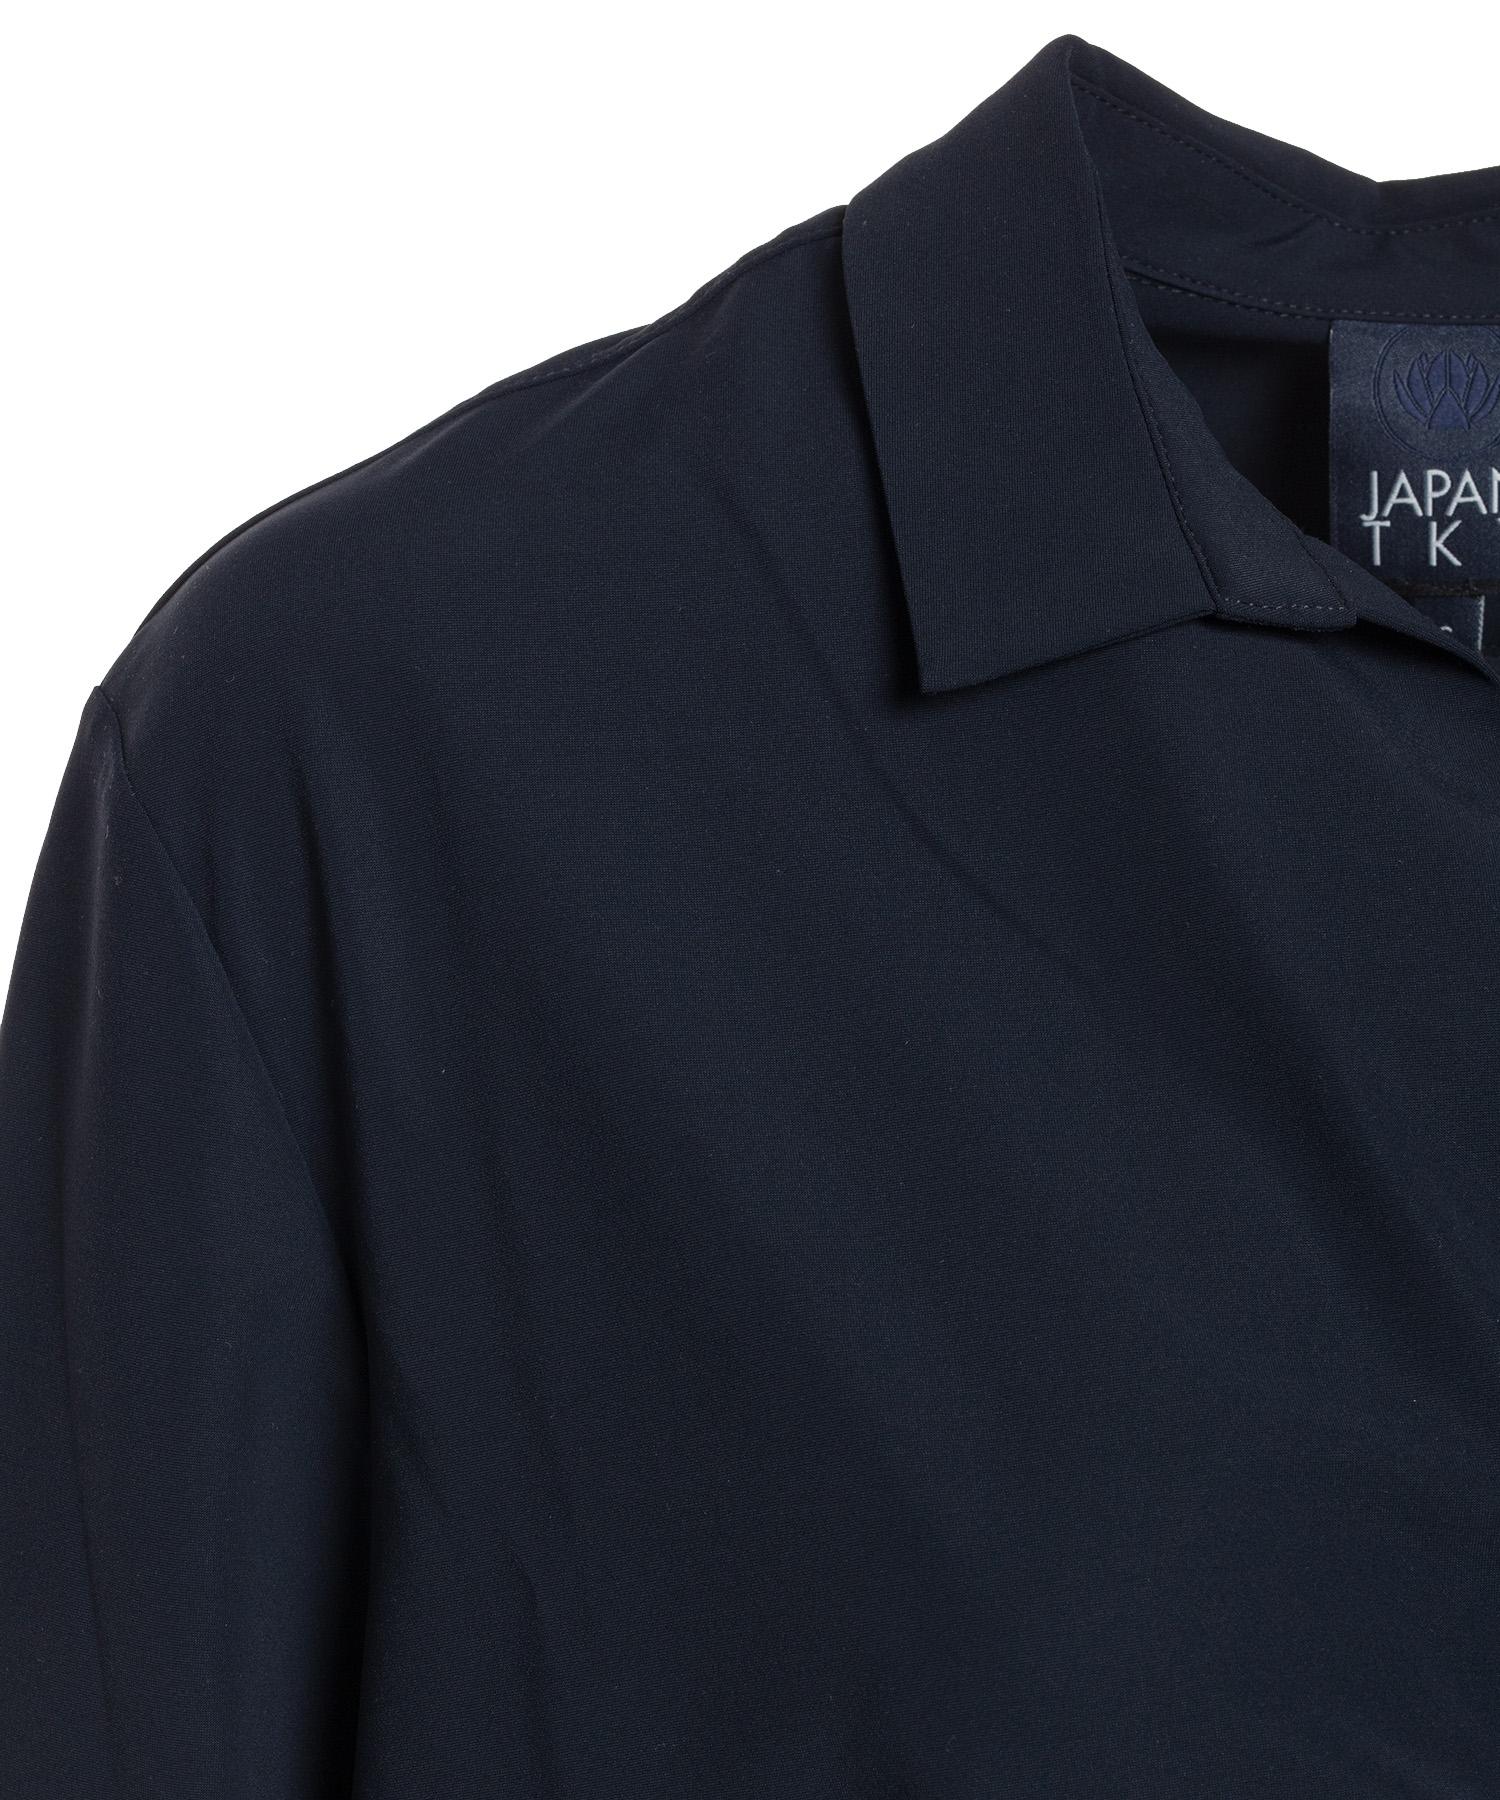 Japan TKY blouse Azue